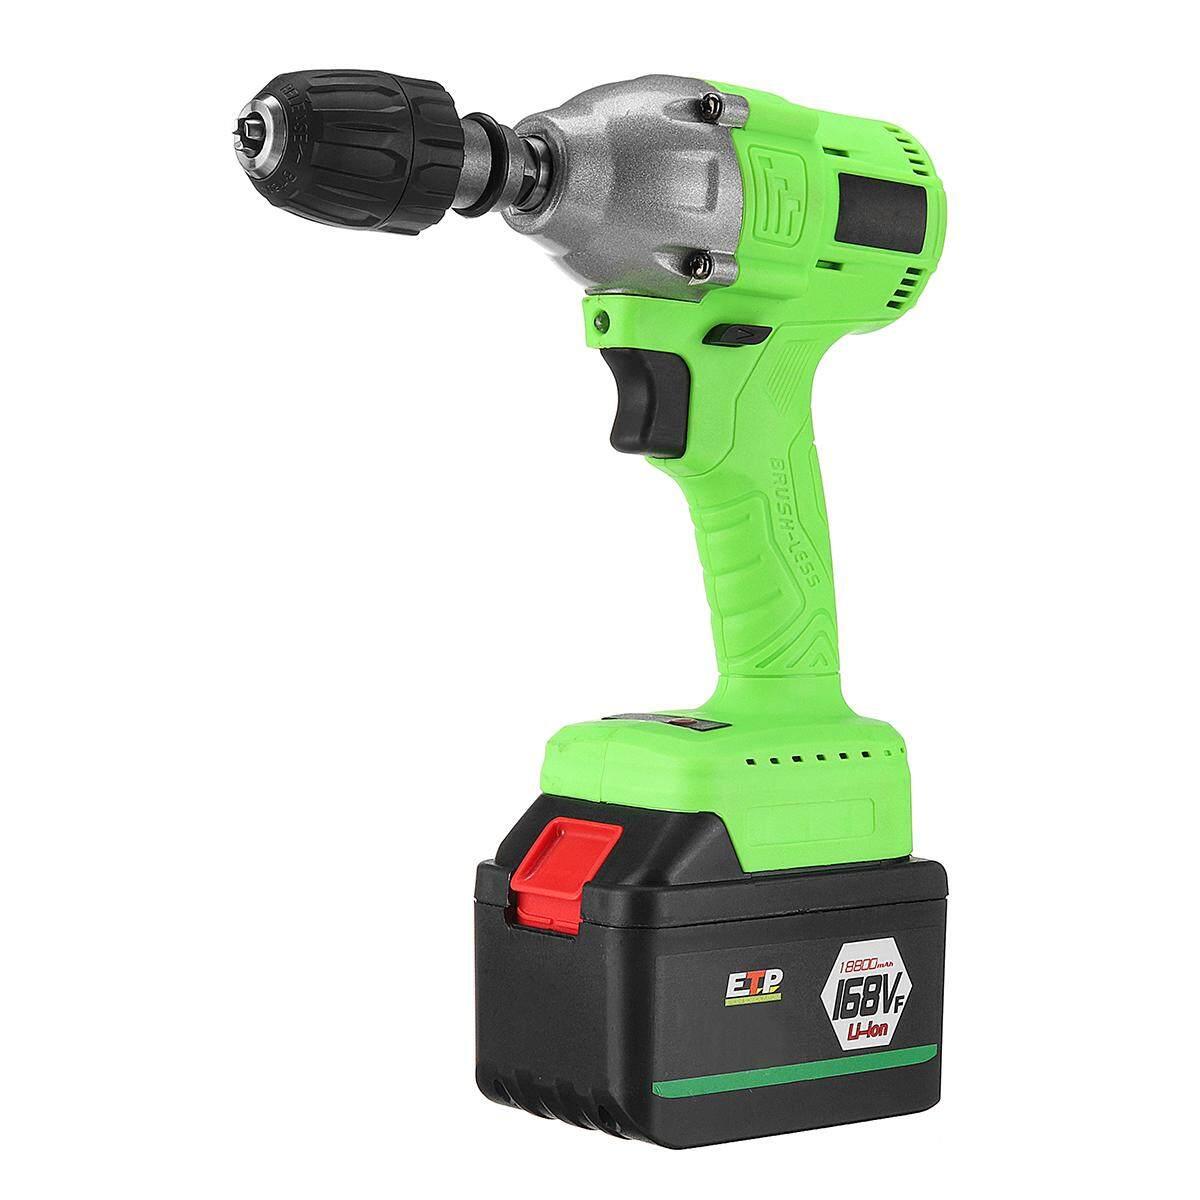 [168V] Brushless Cordless Impact Wrench Drill Socket 10MM Dia DIY Tool